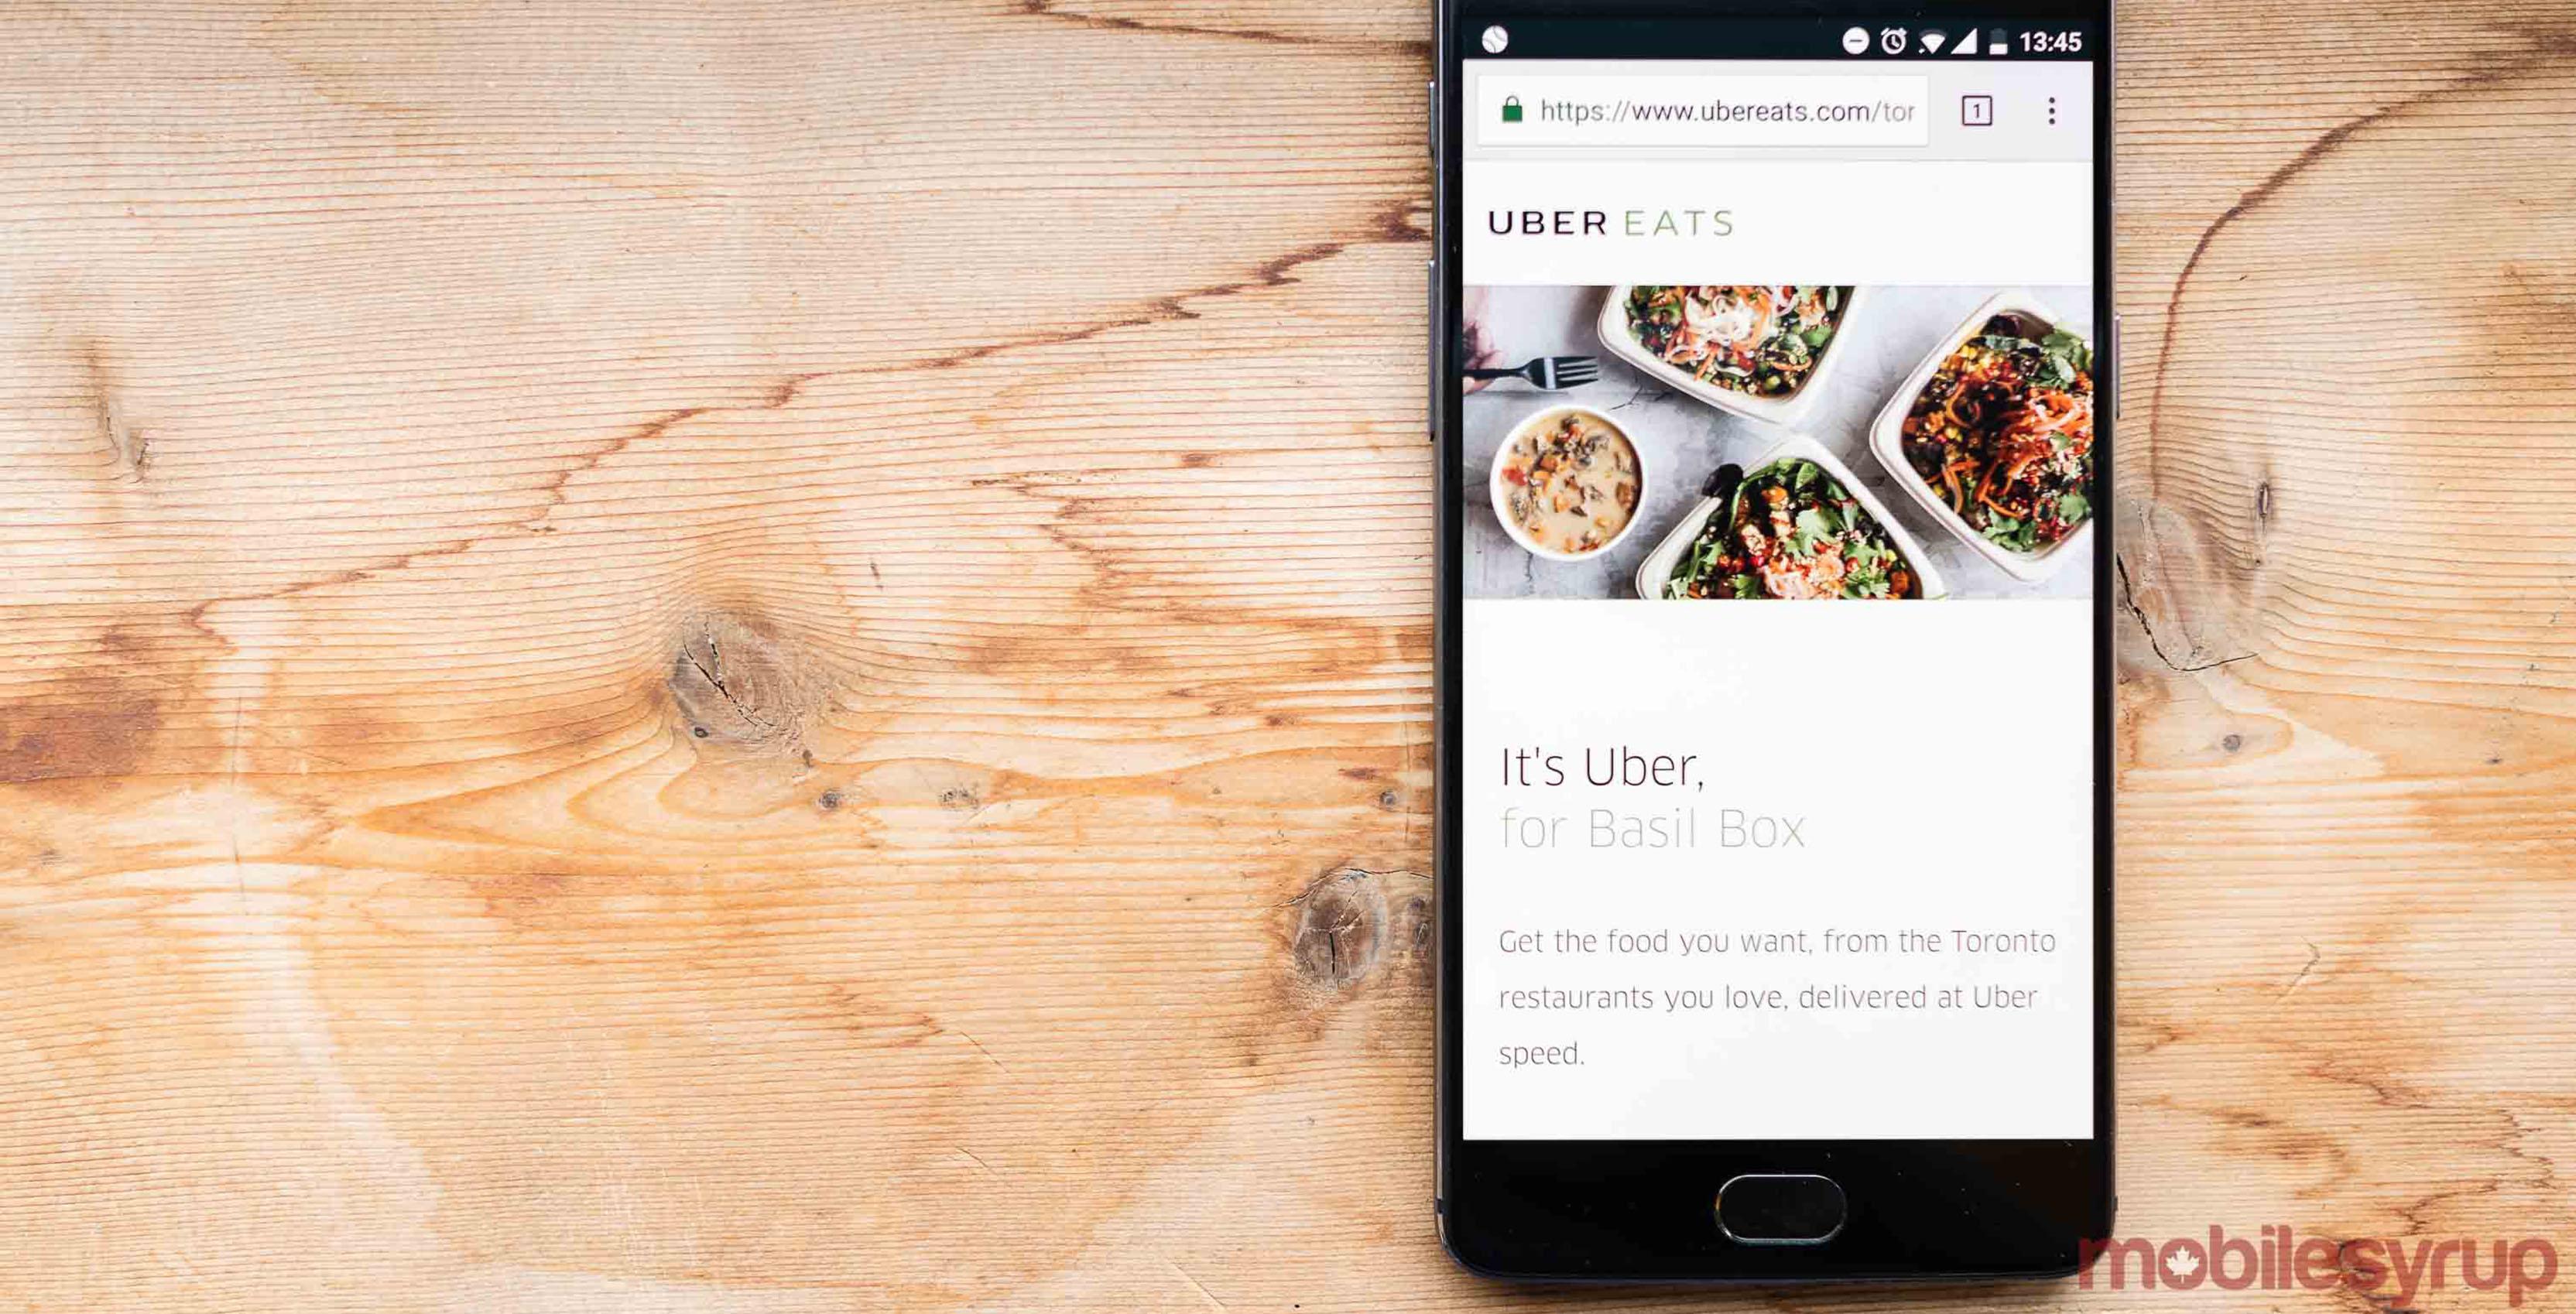 uber eats promo code reddit may